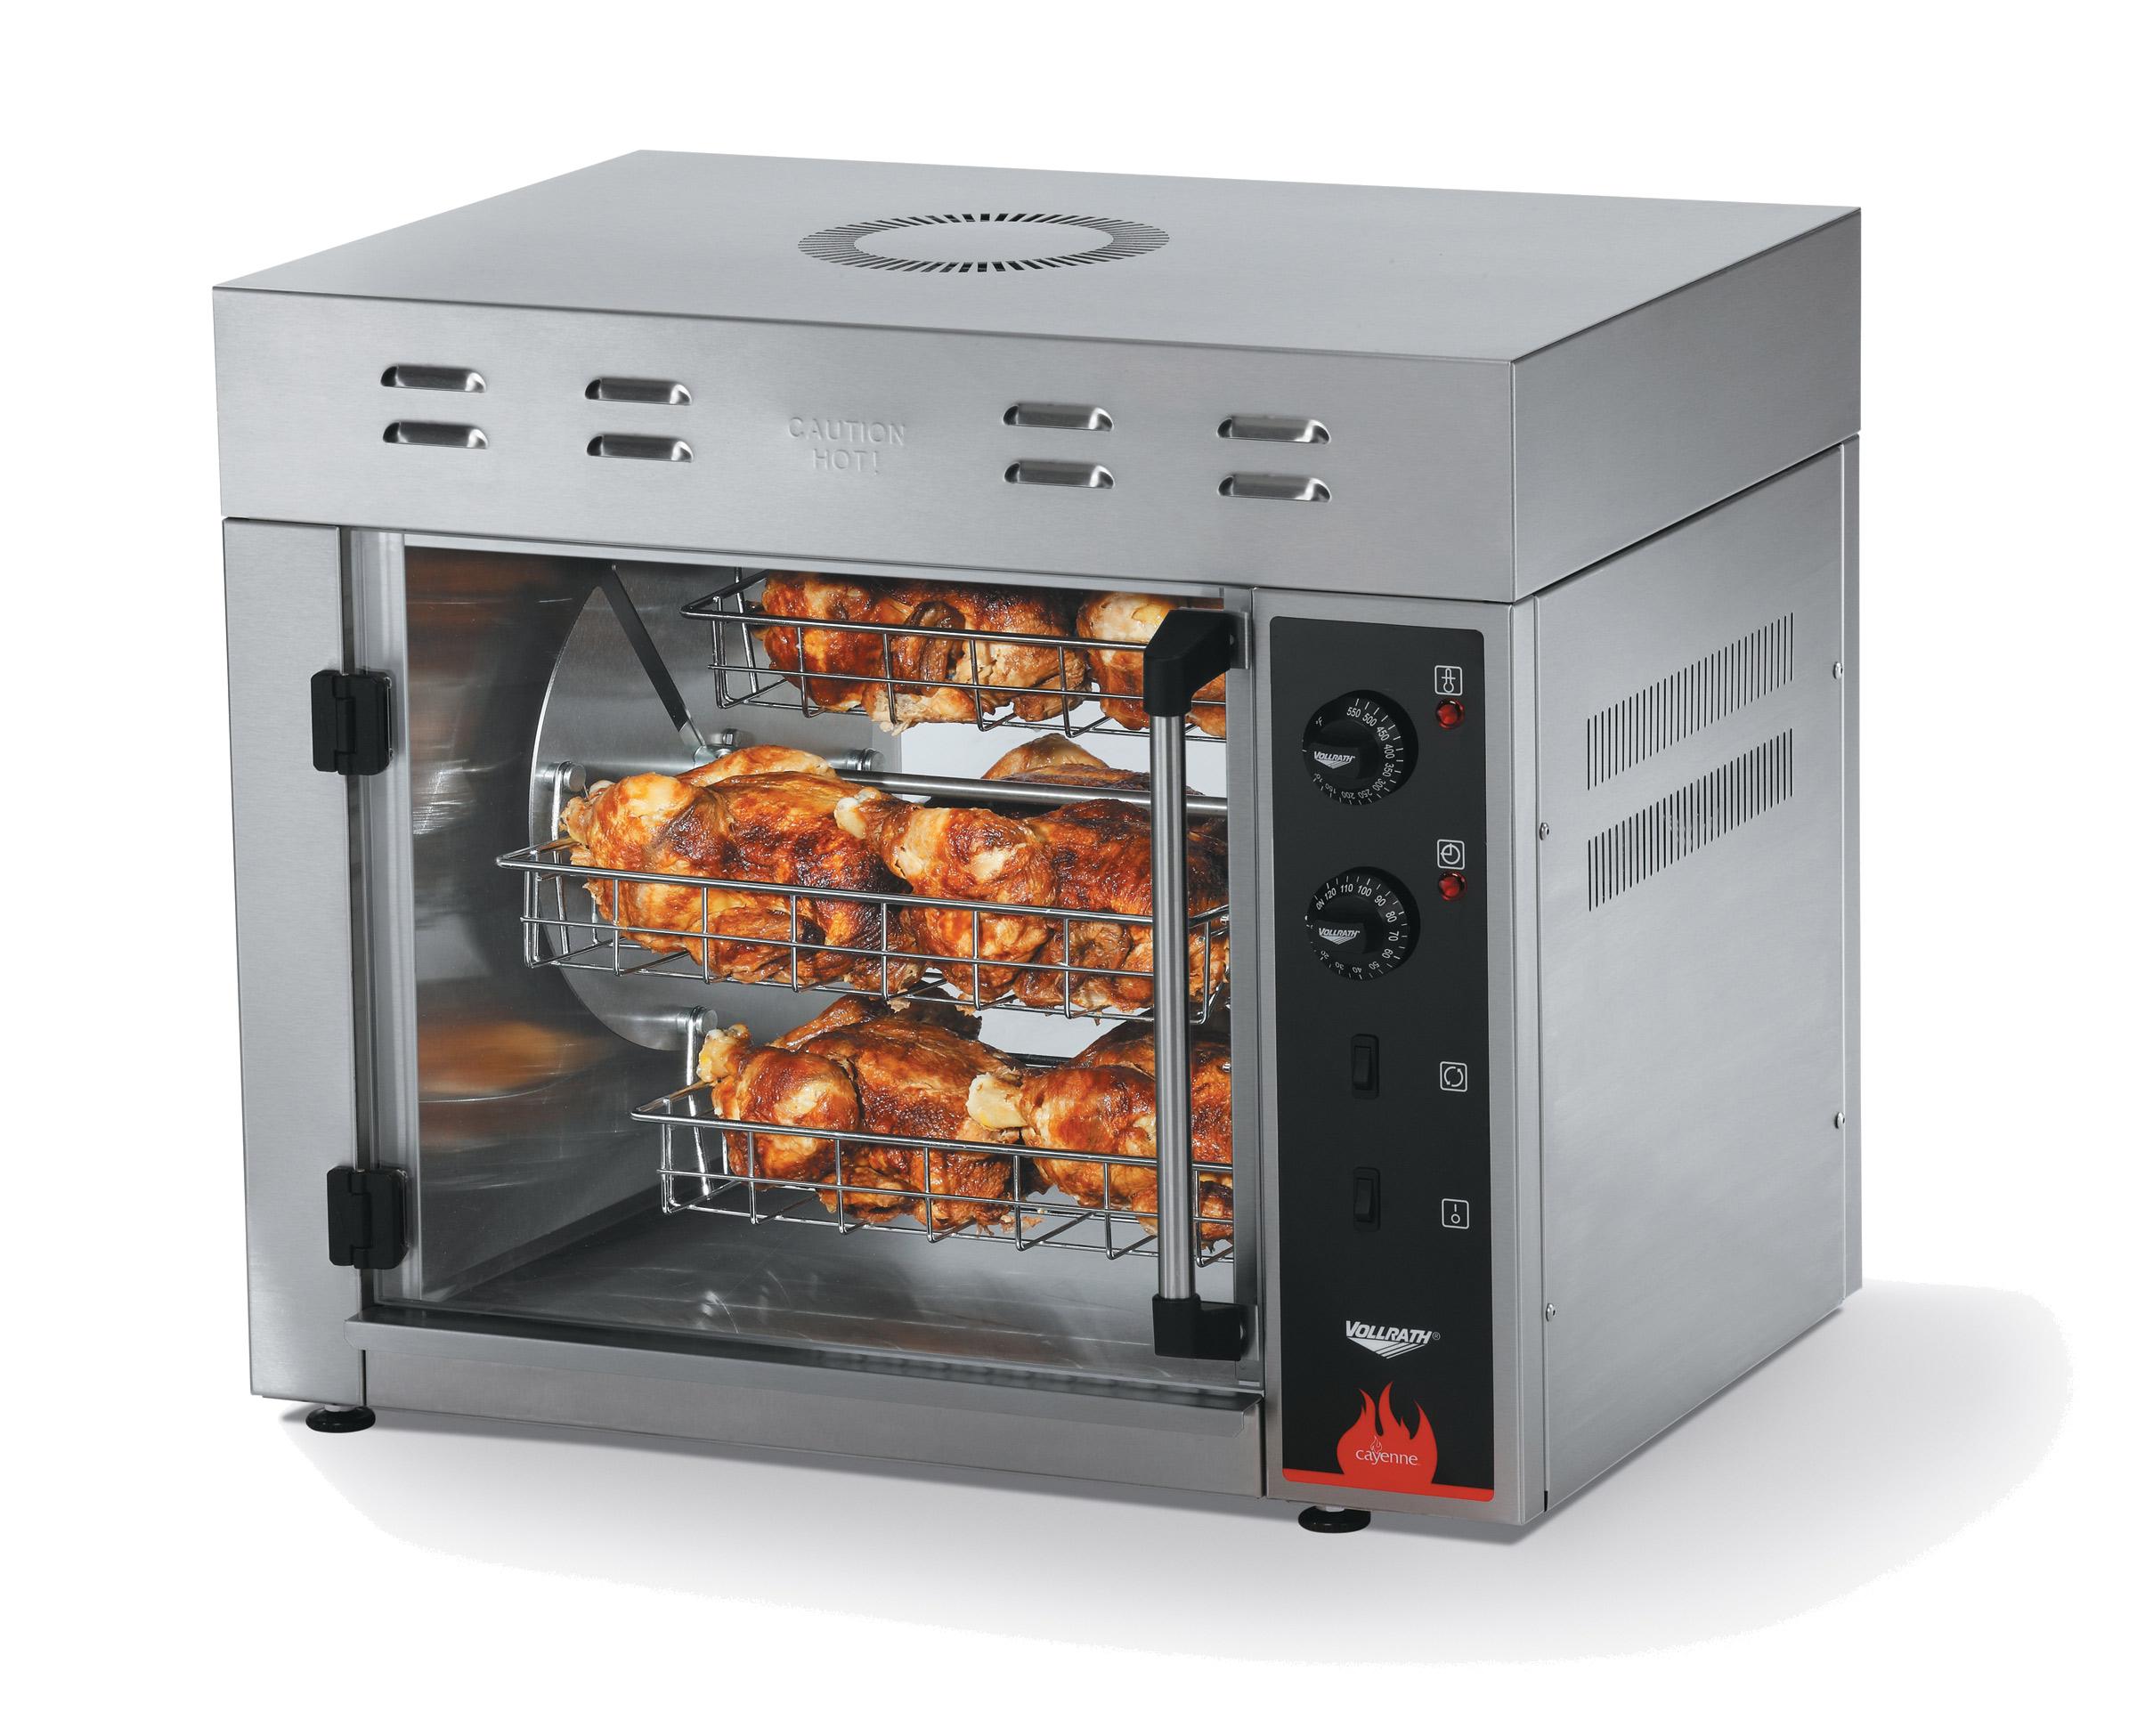 Vollrath 40704 oven, electric, rotisserie